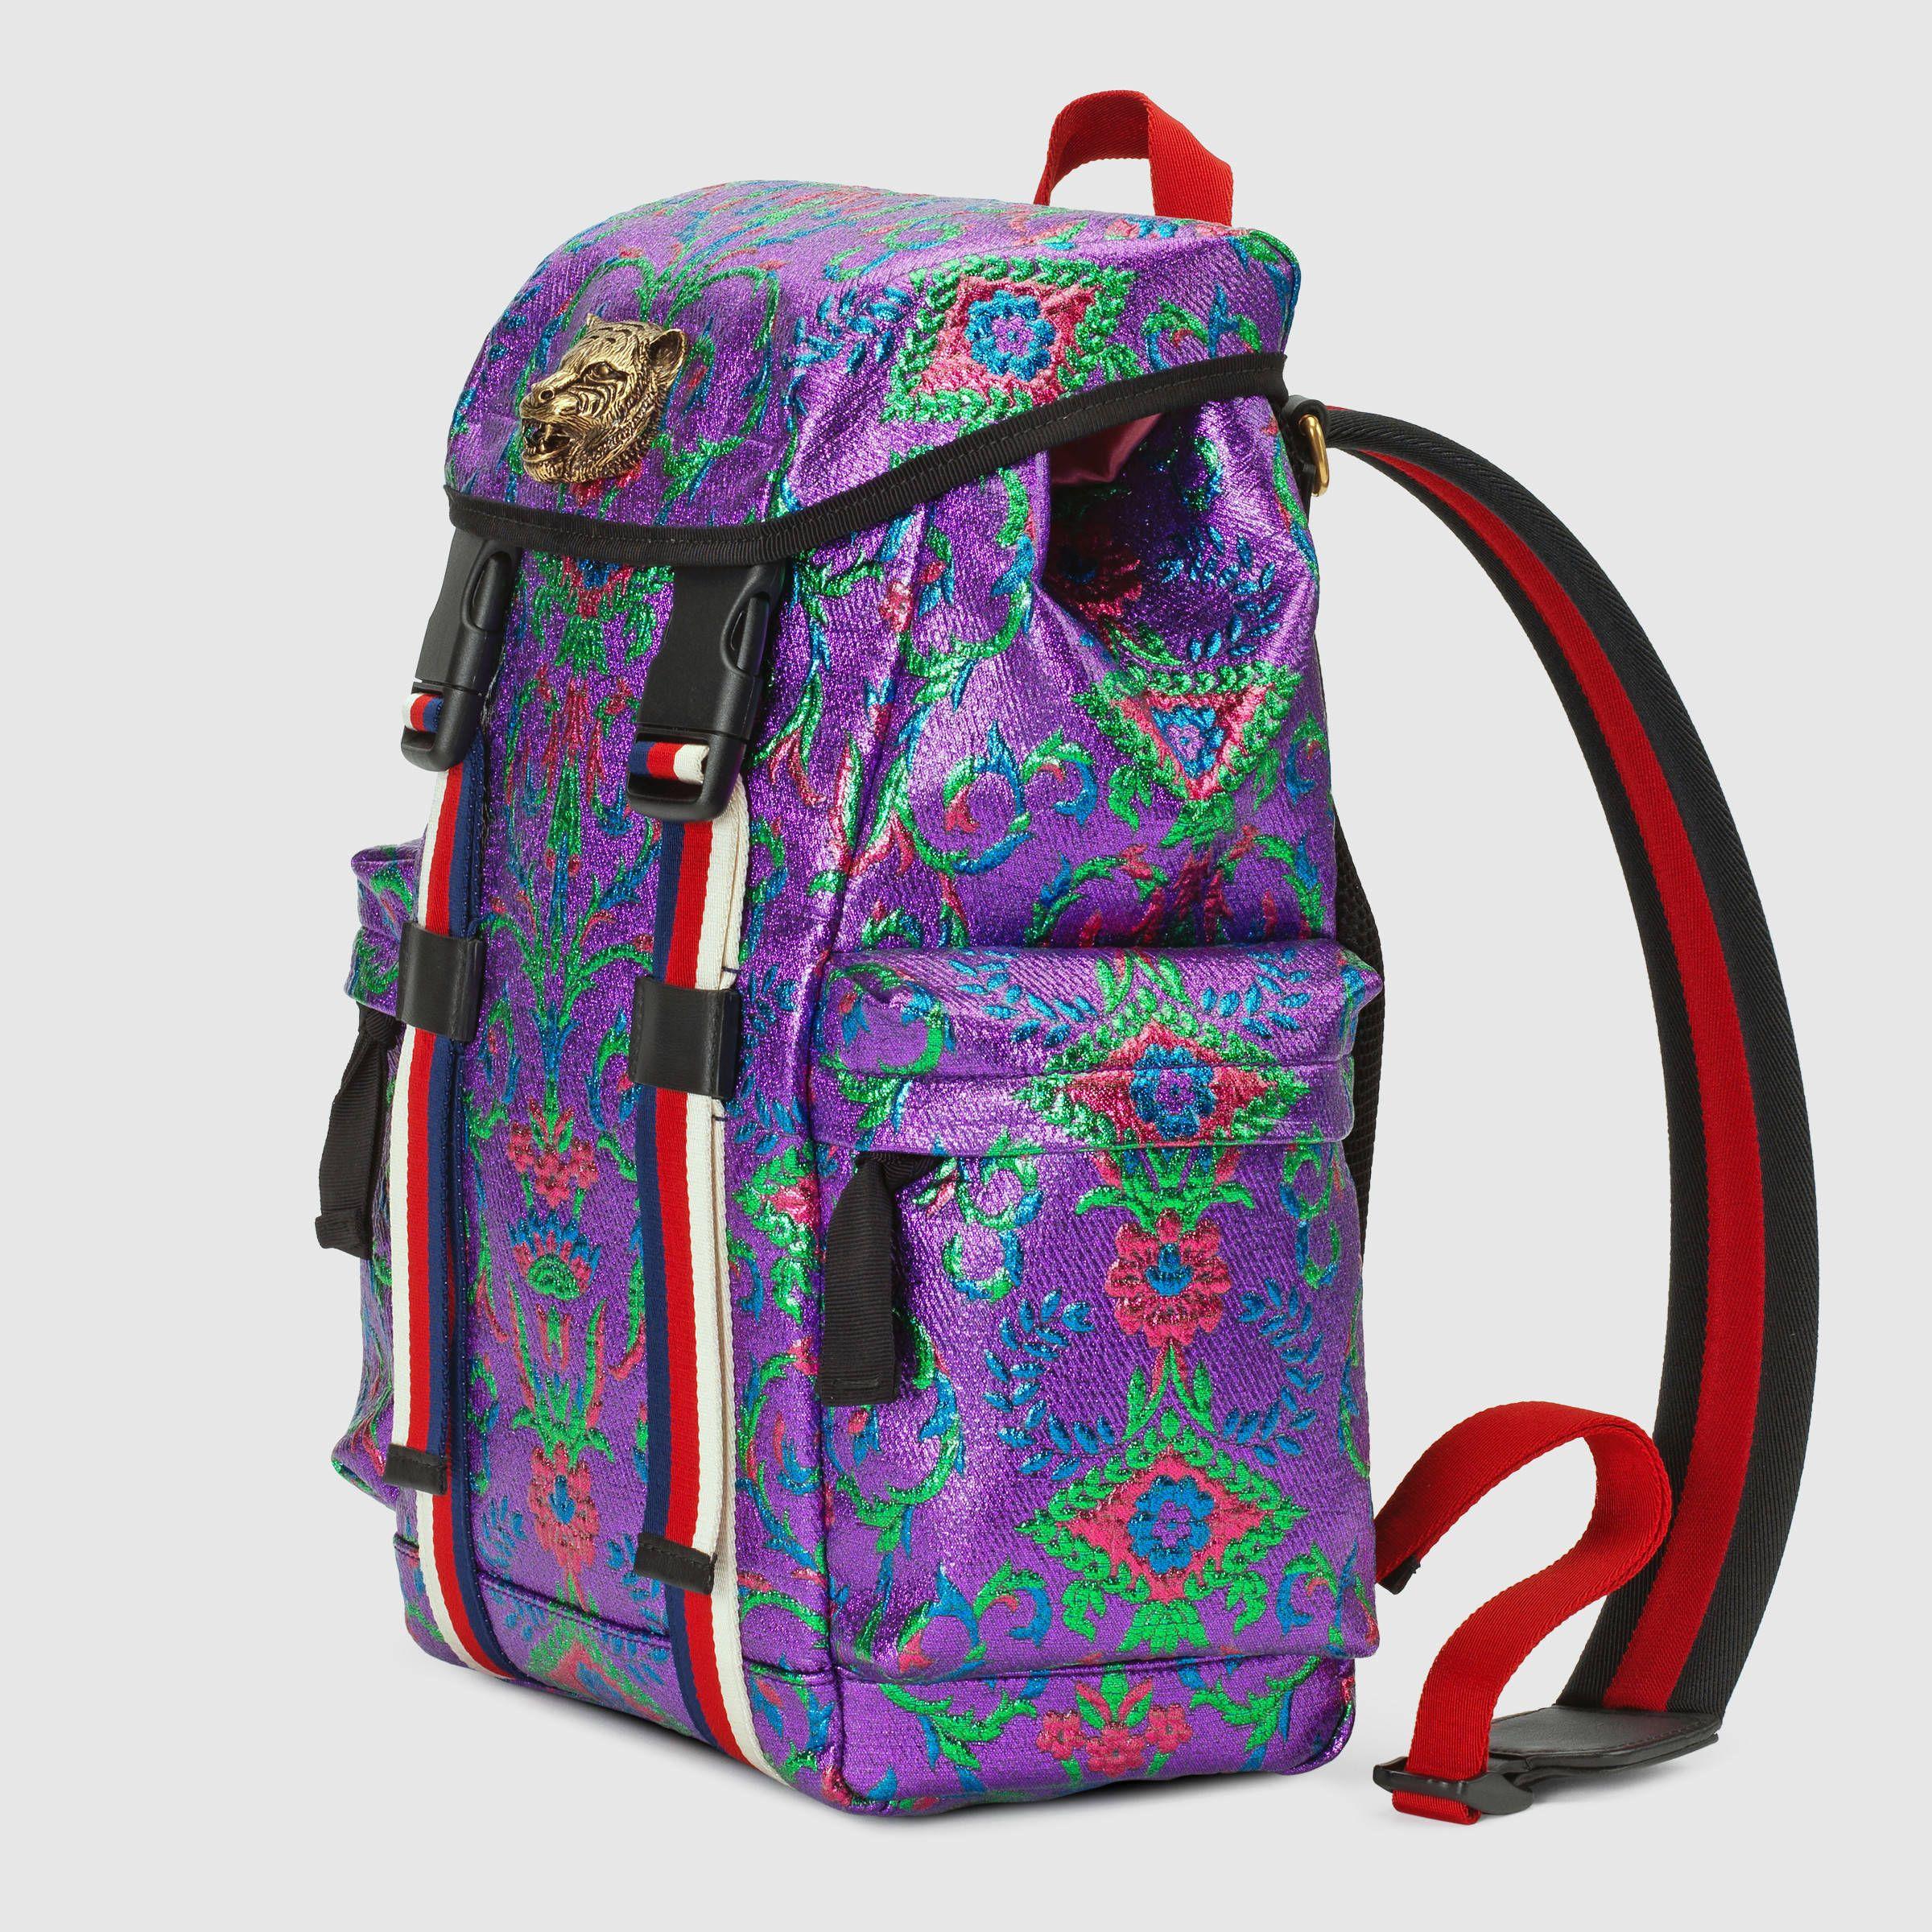 Gucci Multicolor brocade backpack Detail 2   bags   Pinterest ... 0cfbef2d4c